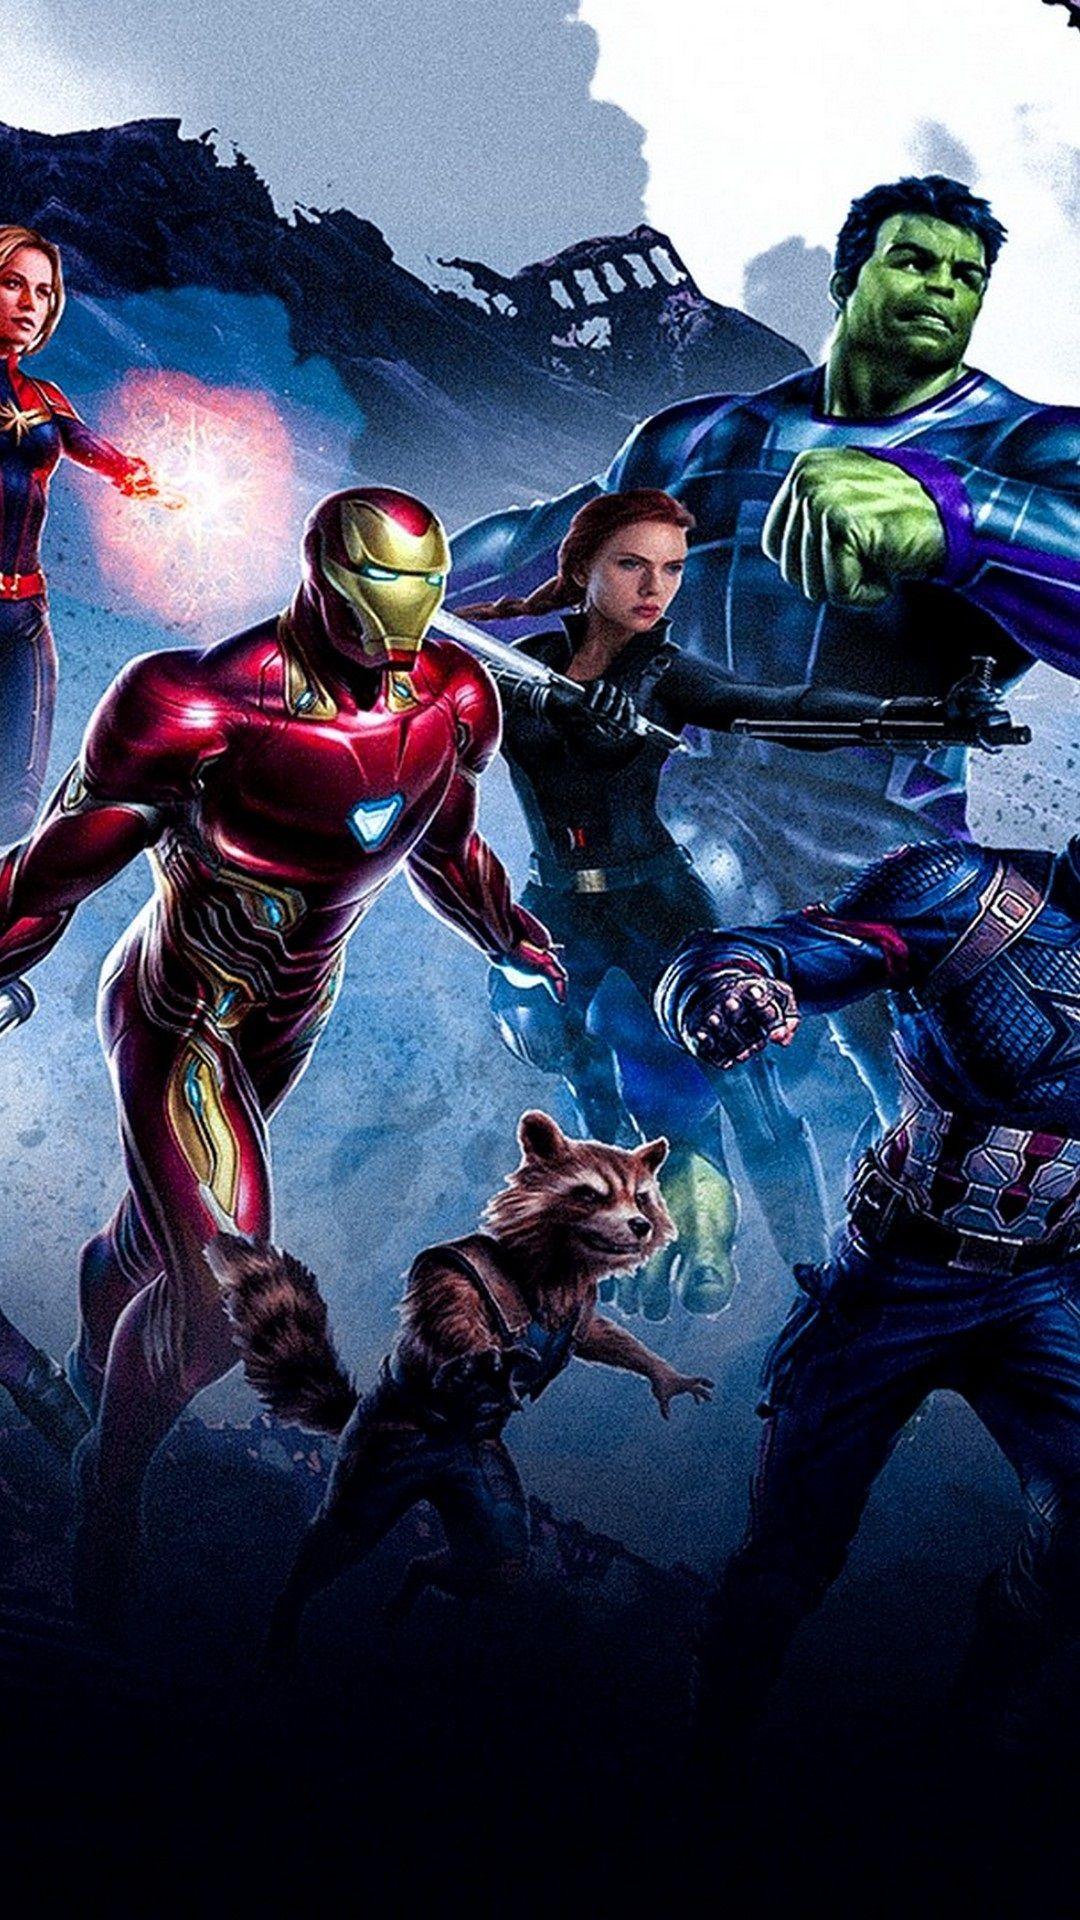 Avengers Endgame Iphone X Wallpaper Hd Best Phone Wallpaper Hd